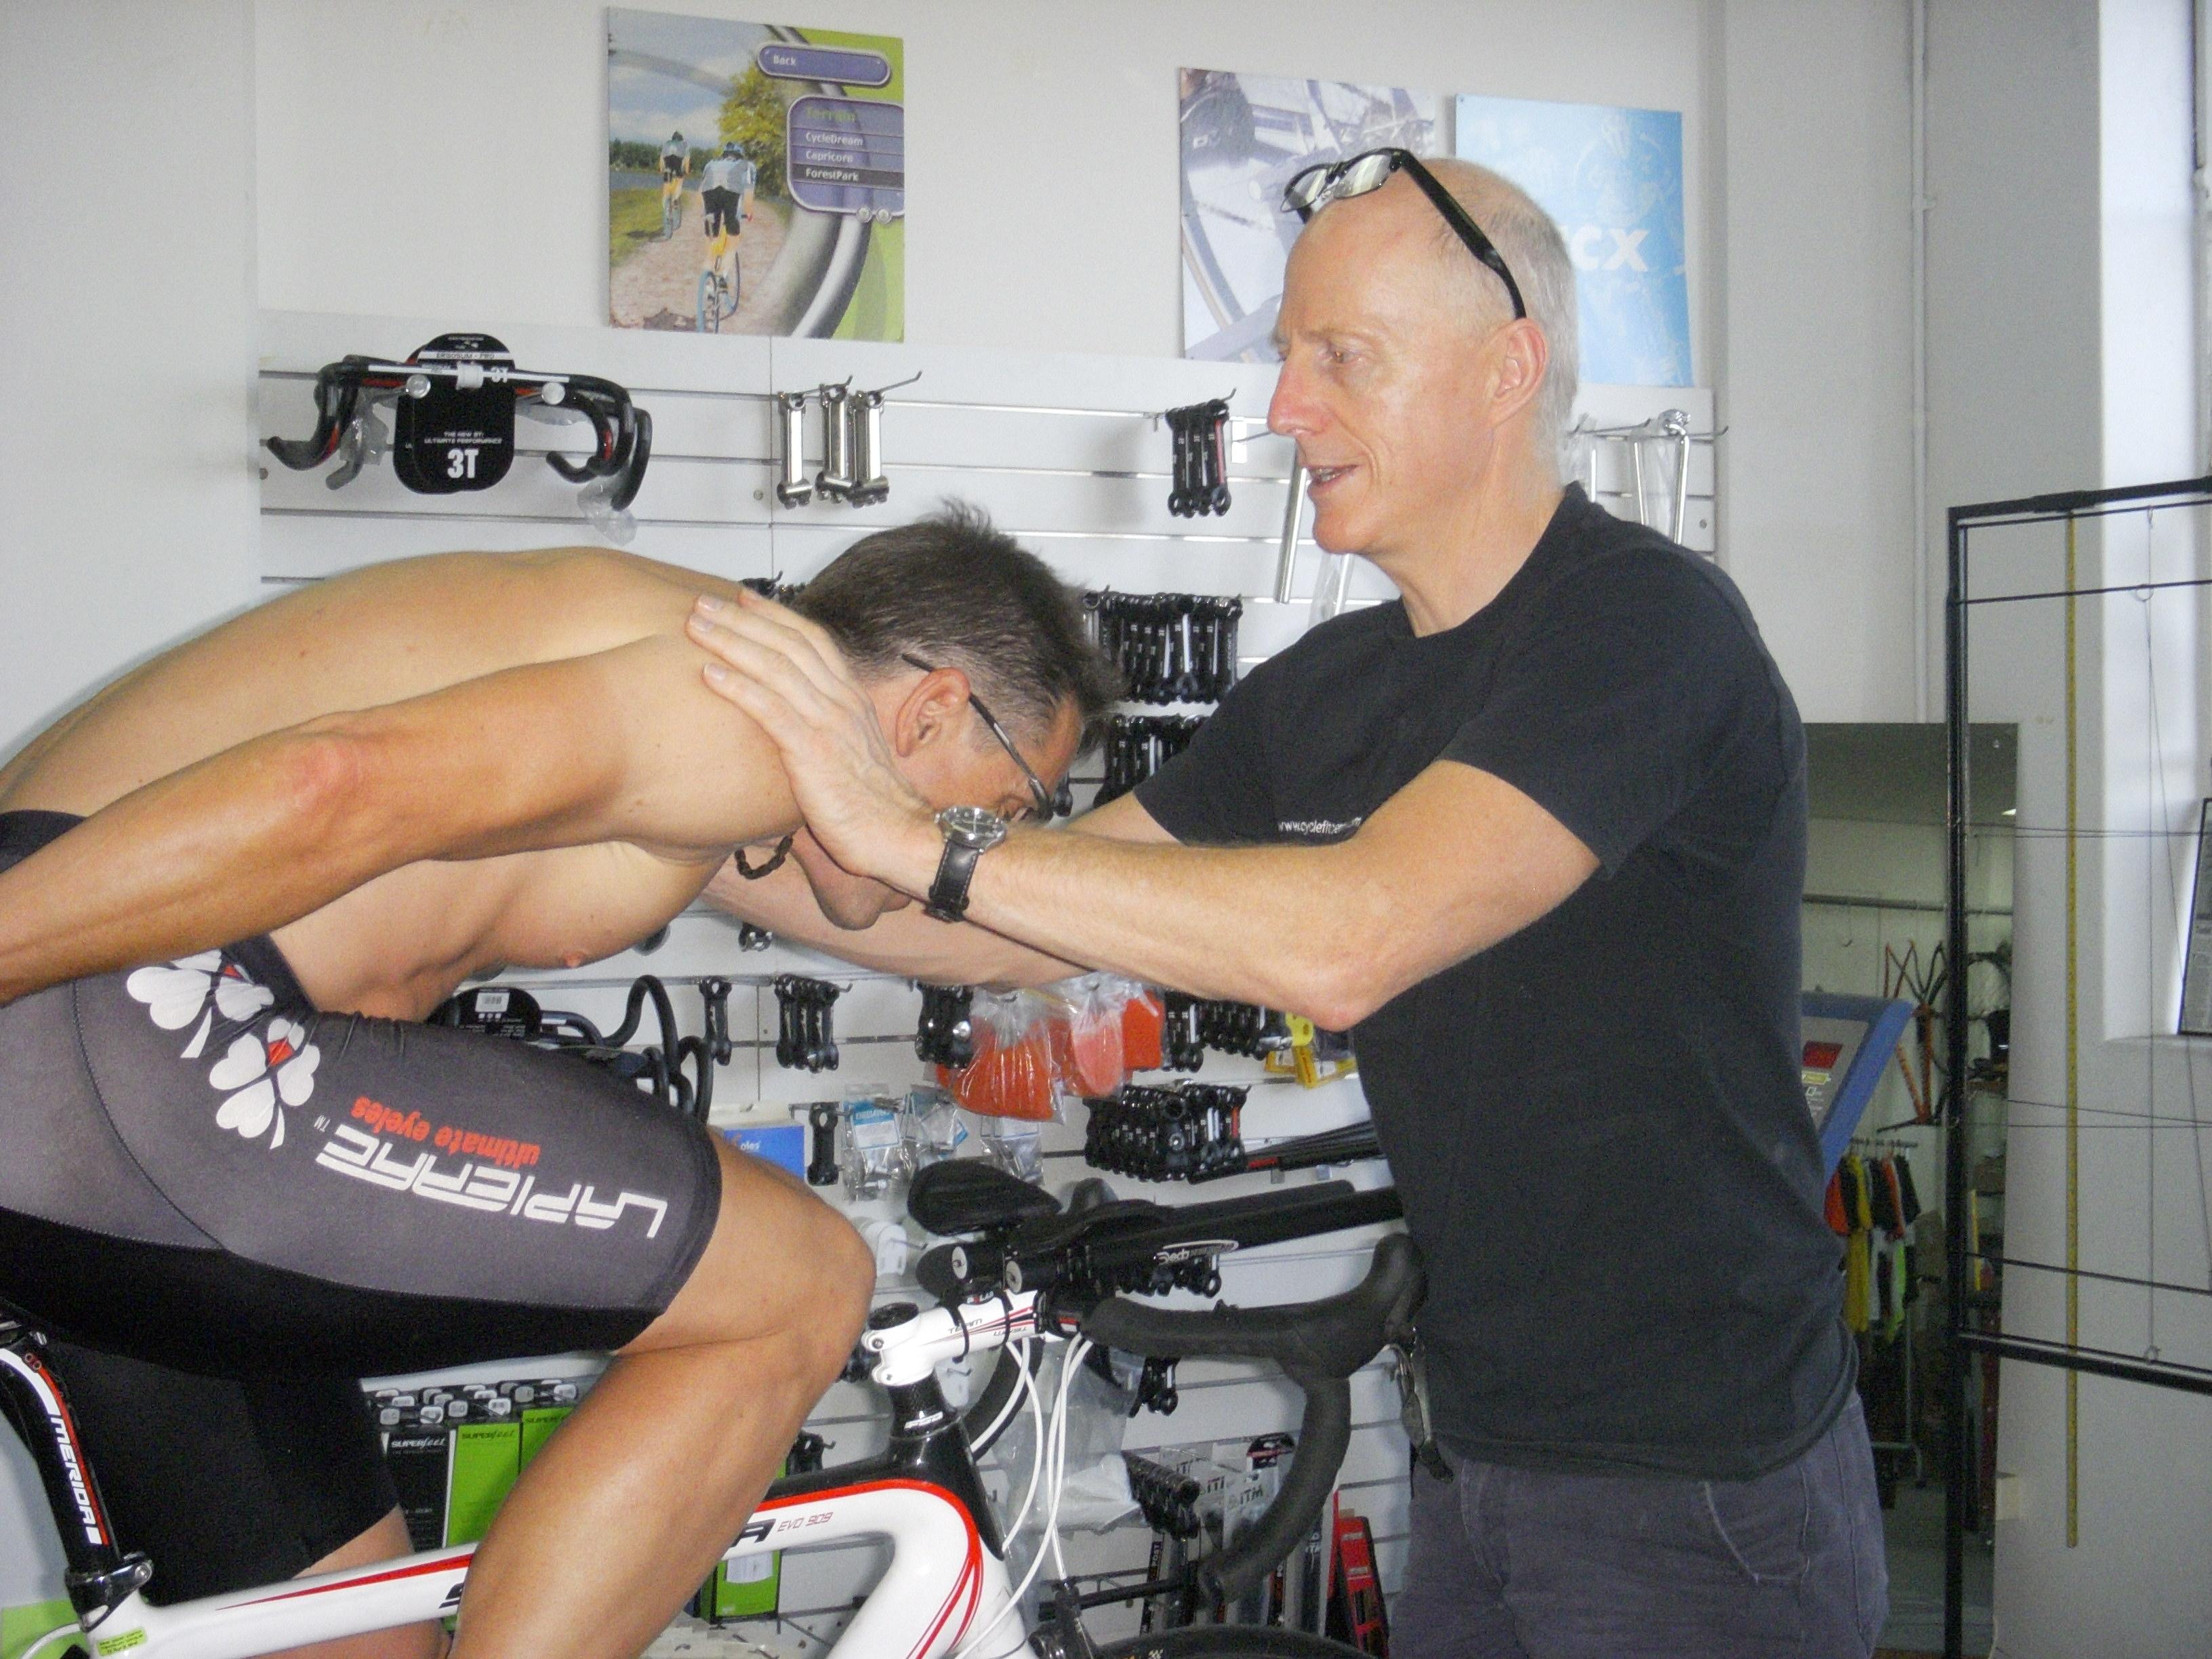 Seat Set Back For Road Bikes The Steve Hogg Bike Fitting Website Chicken Wing Diagram To Human Arm Bones